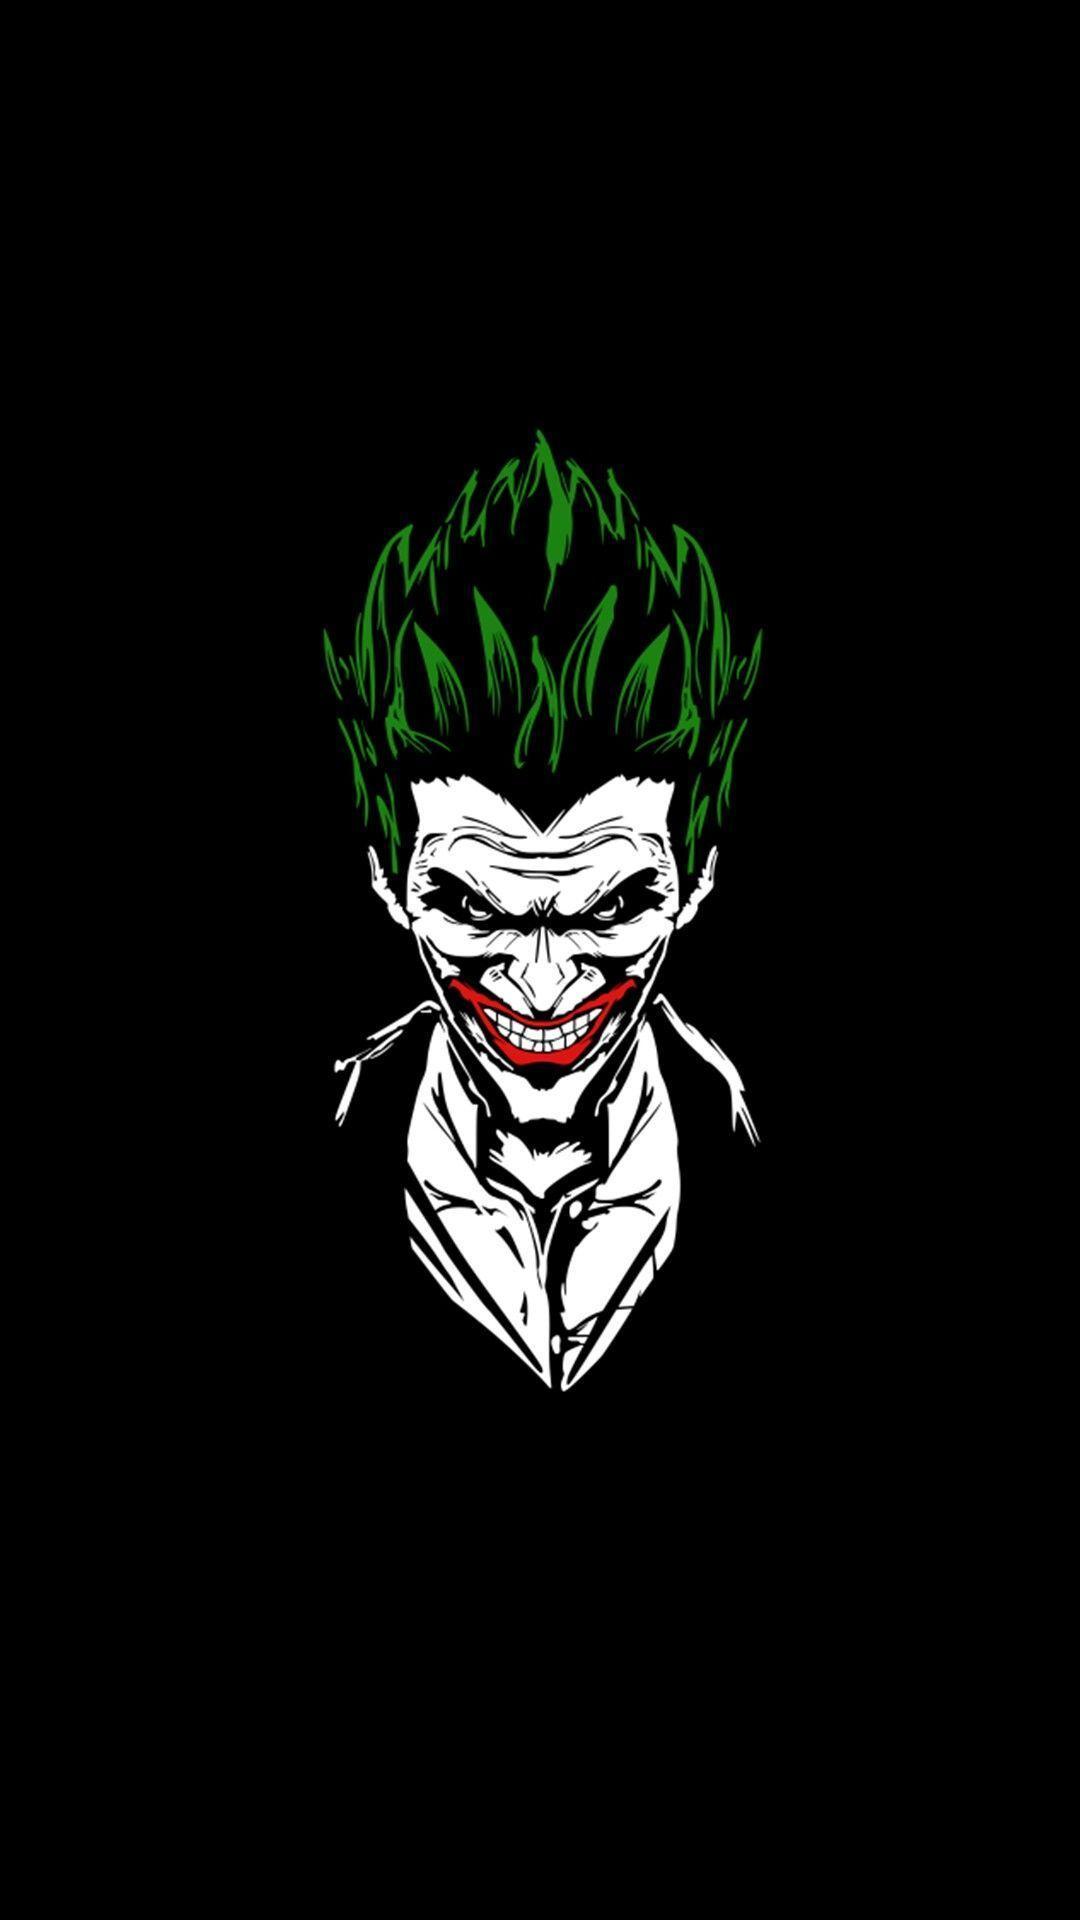 Joker Images Cartoon : joker, images, cartoon, Joker, Cartoon, Phone, Wallpapers, Backgrounds, WallpaperAccess